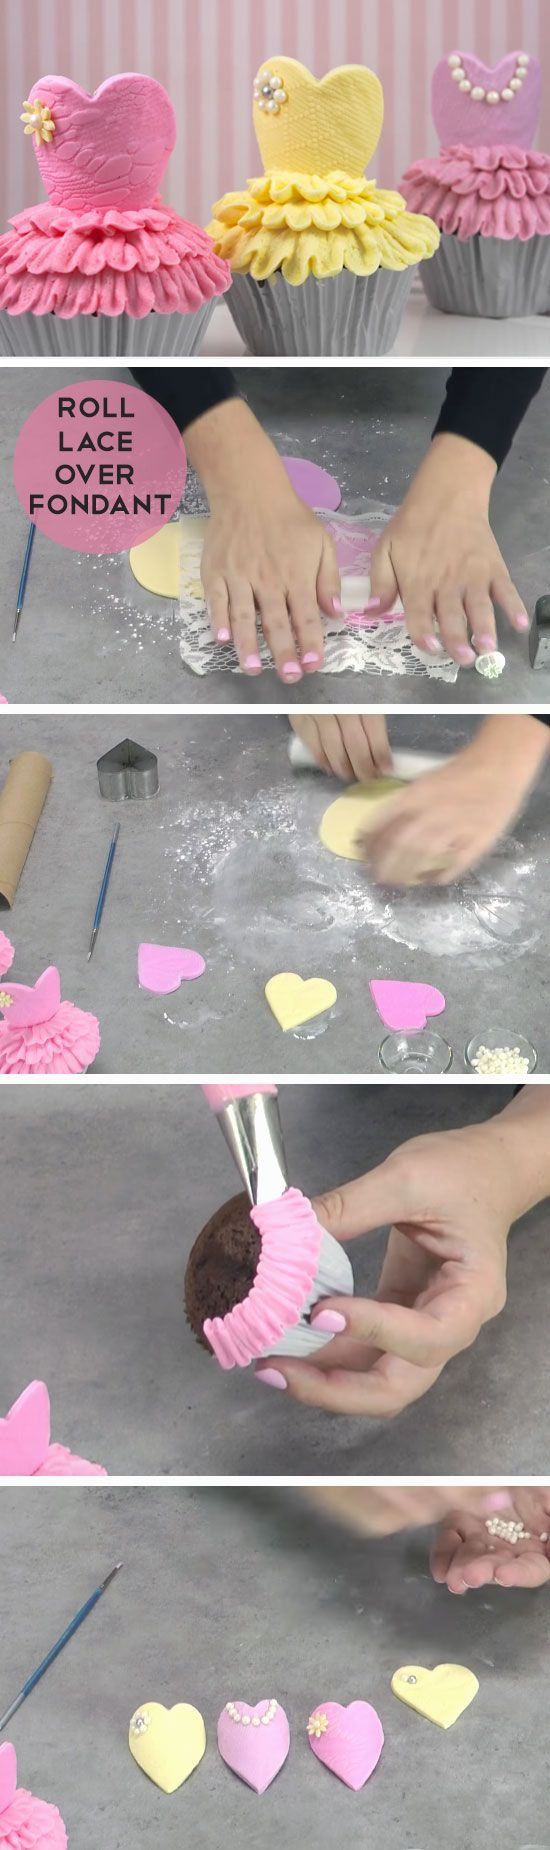 Ballerina Cupcakes | DIY Baby Shower Ideas for a Girl | Easy Birthday Party Ideas for Girls DIY